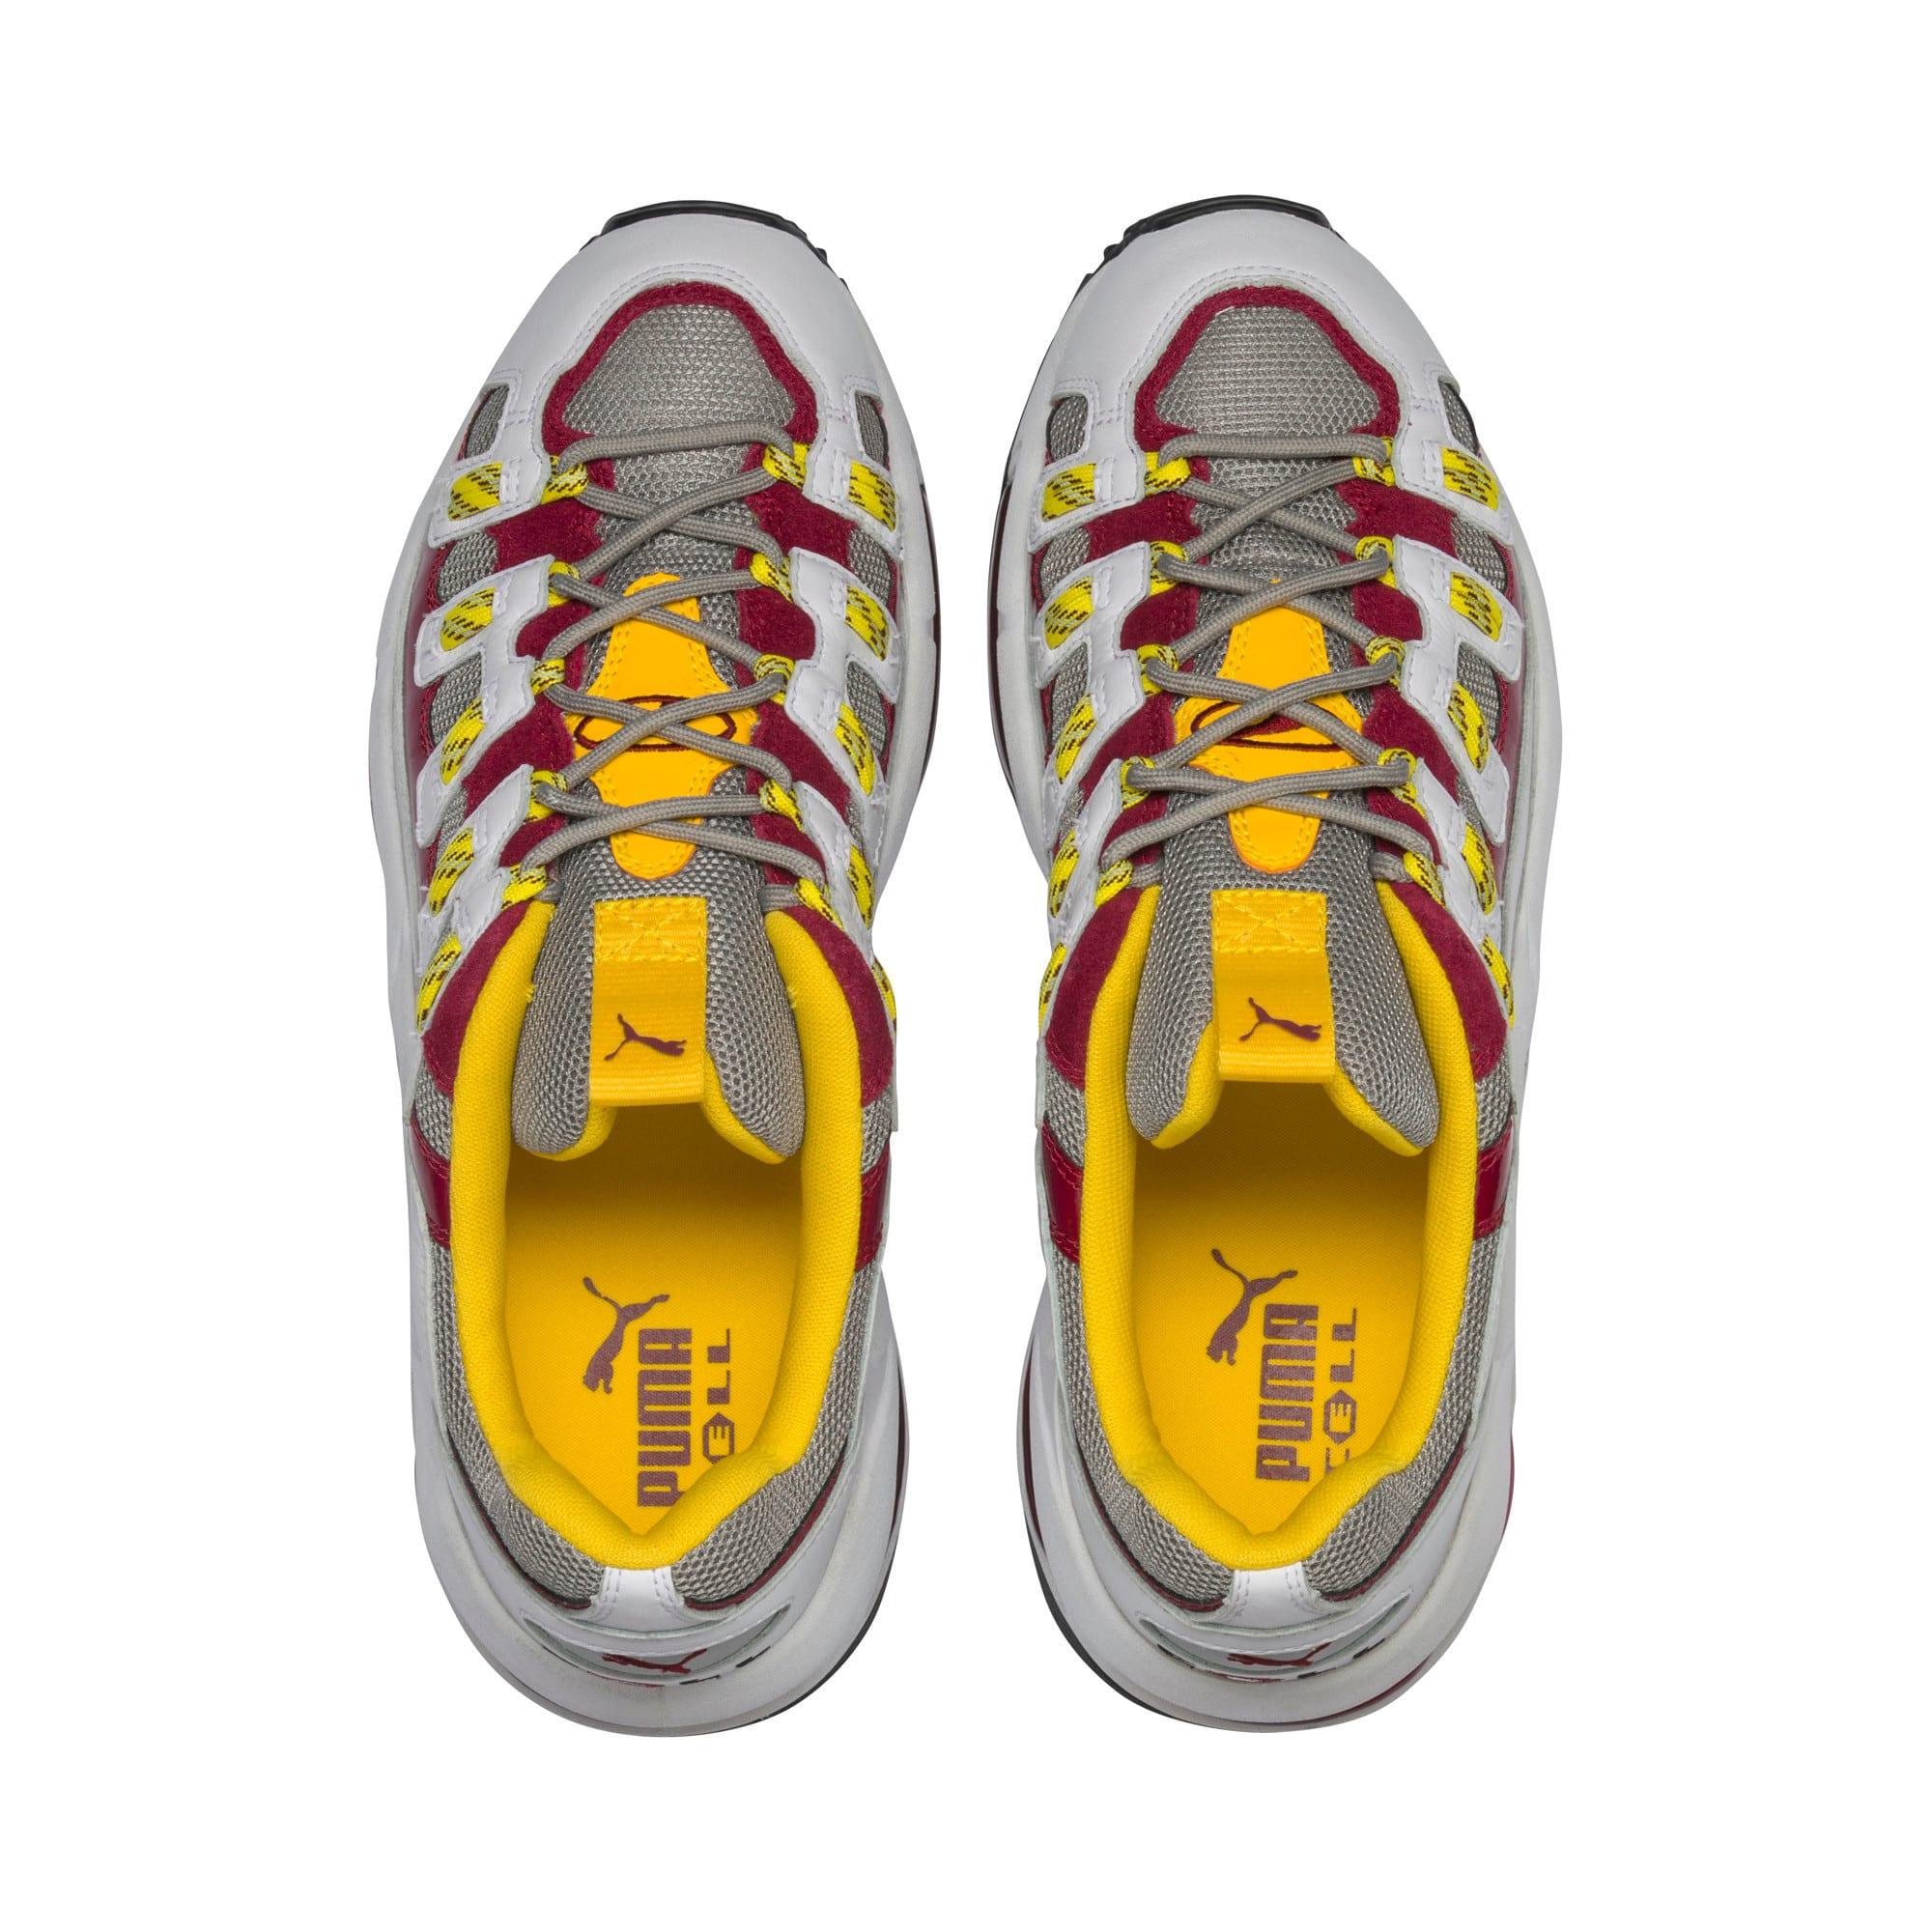 Thumbnail 7 of CELL Endura Patent 98 Men's Sneakers, Limestone-Cordovan, medium